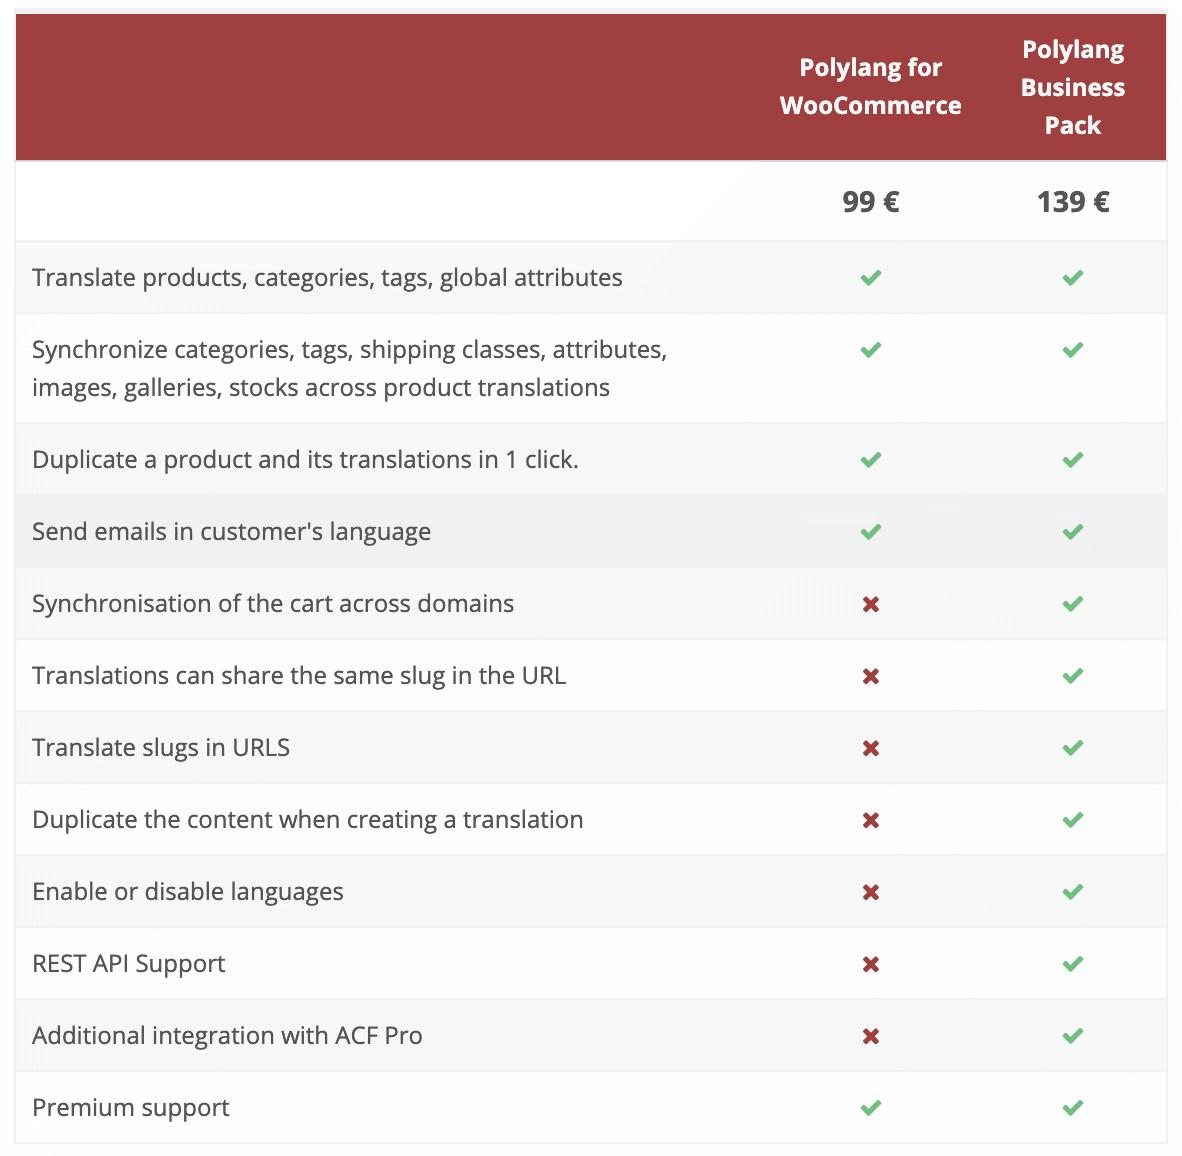 versión Polylang para WooCommerce